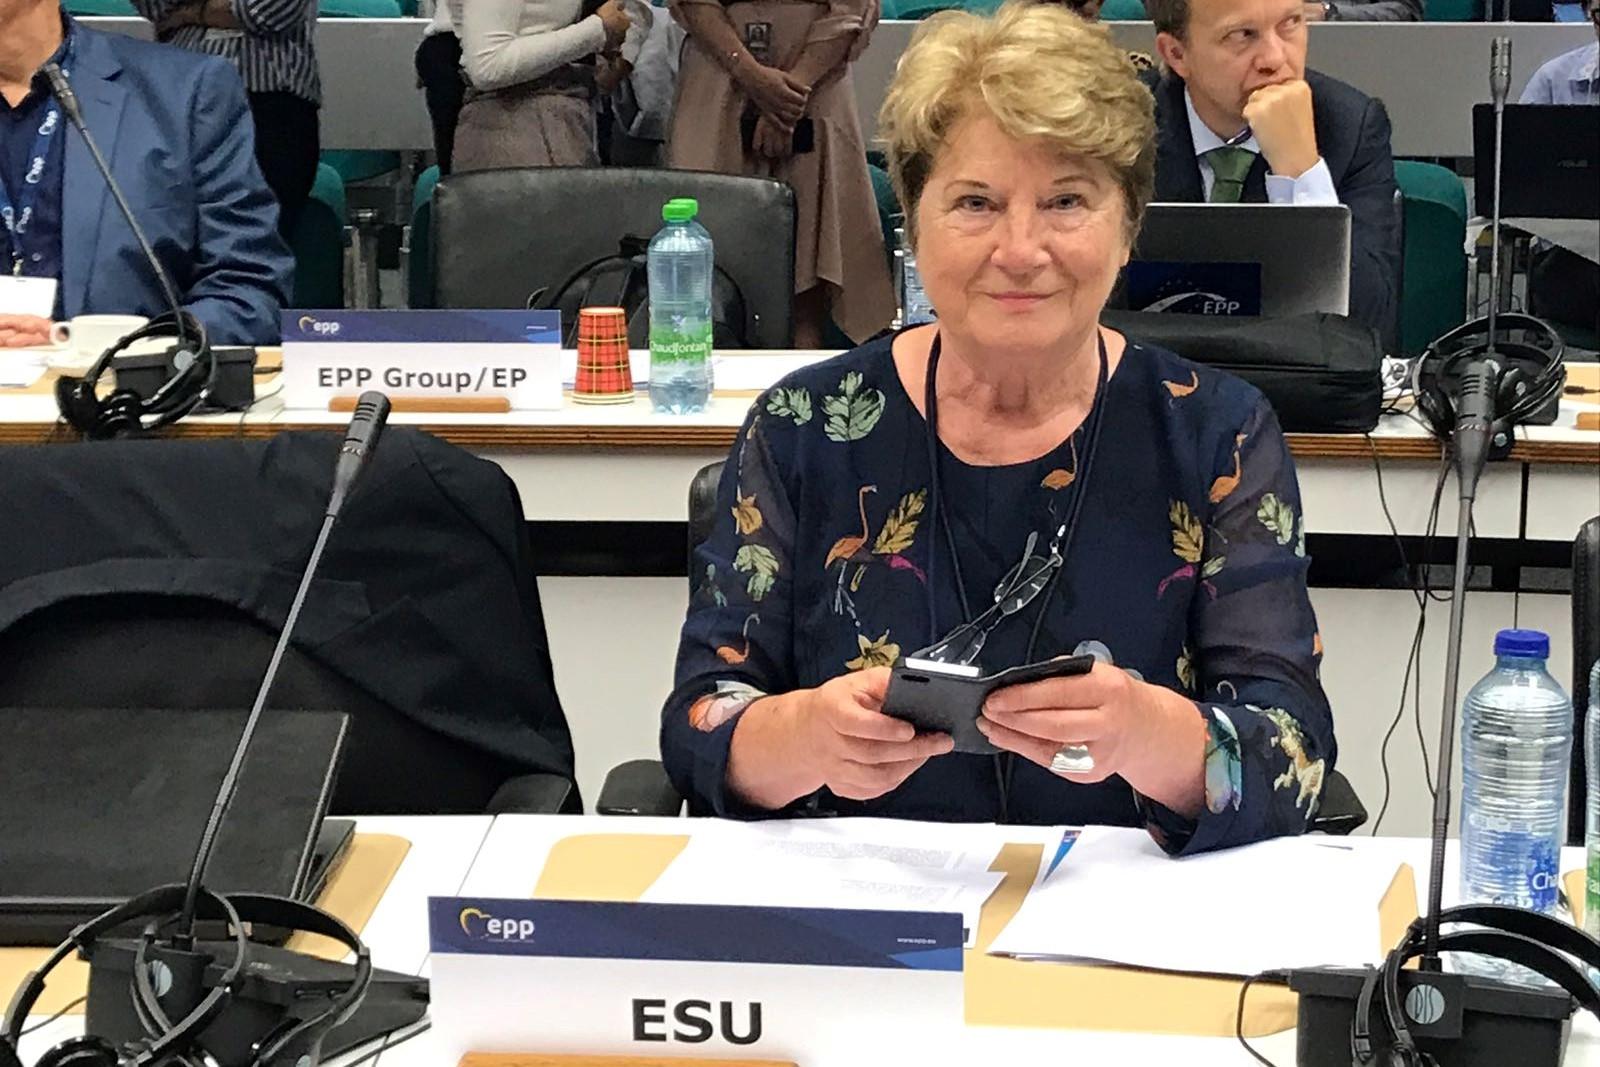 An Hermans, predsednica zveze upokojencev (European Seniors' Union – ESU). Vir slike: Facebook stran An Hermans.